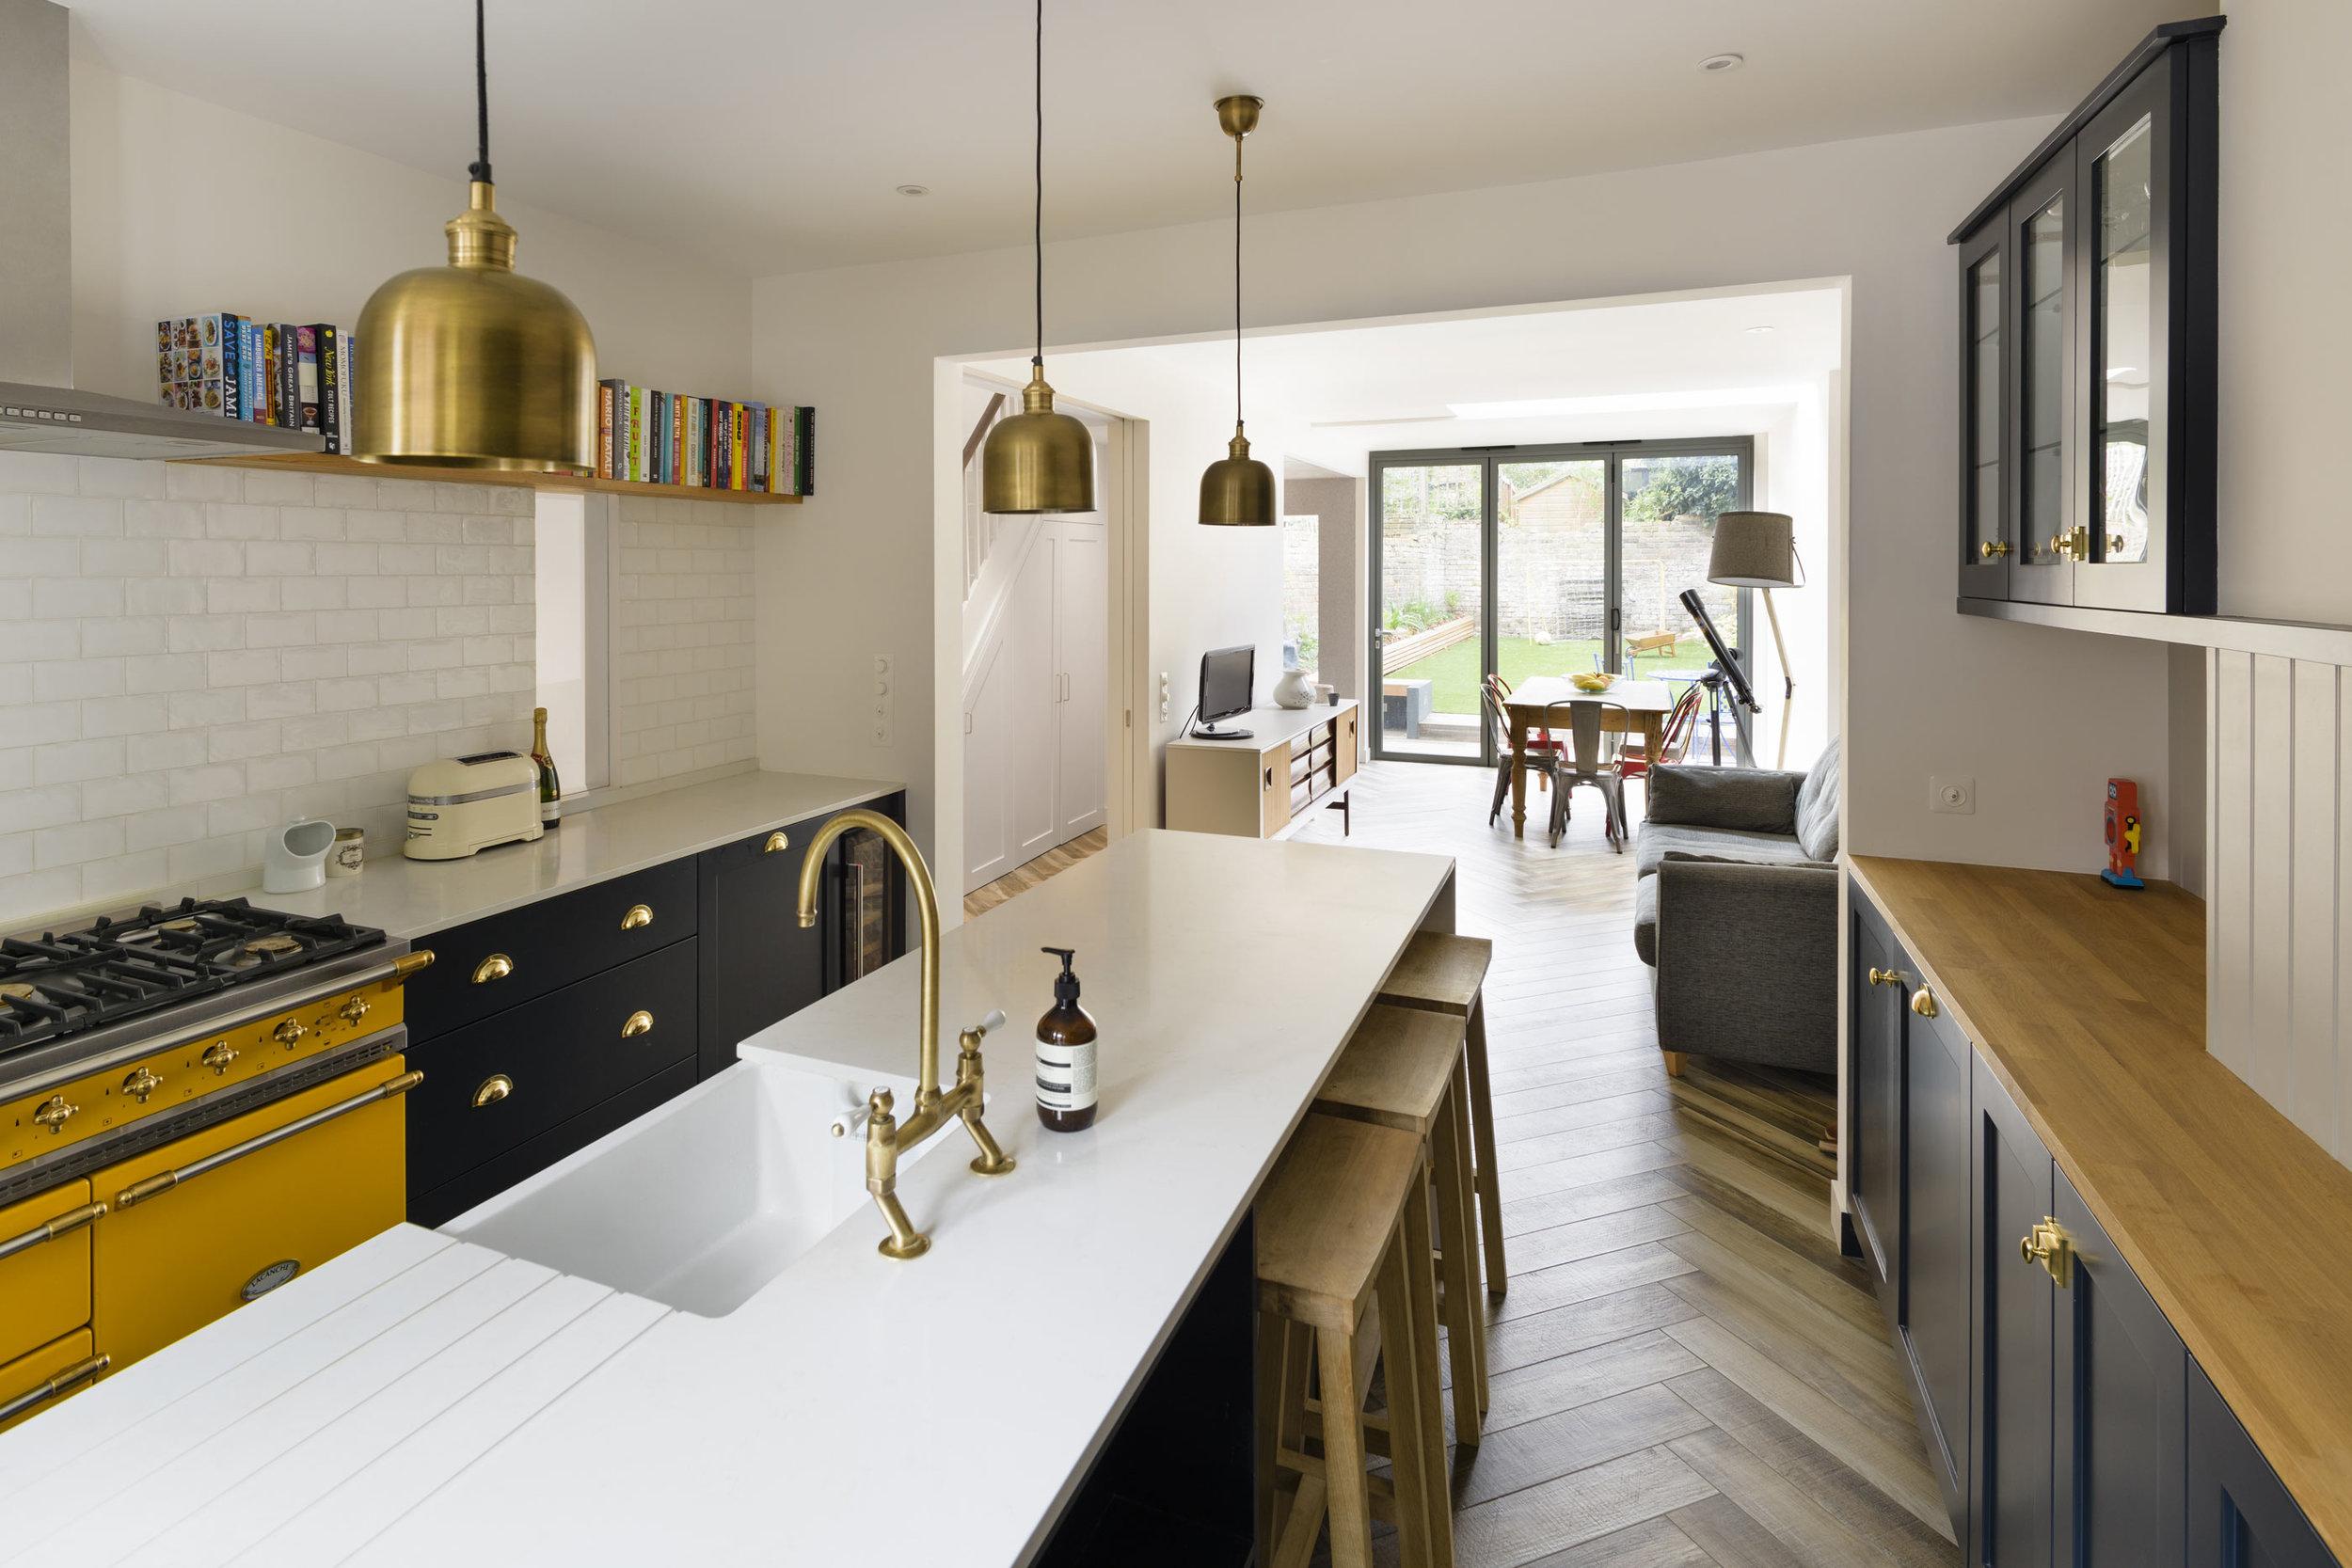 Kitchen-looking-towards-rear.jpg